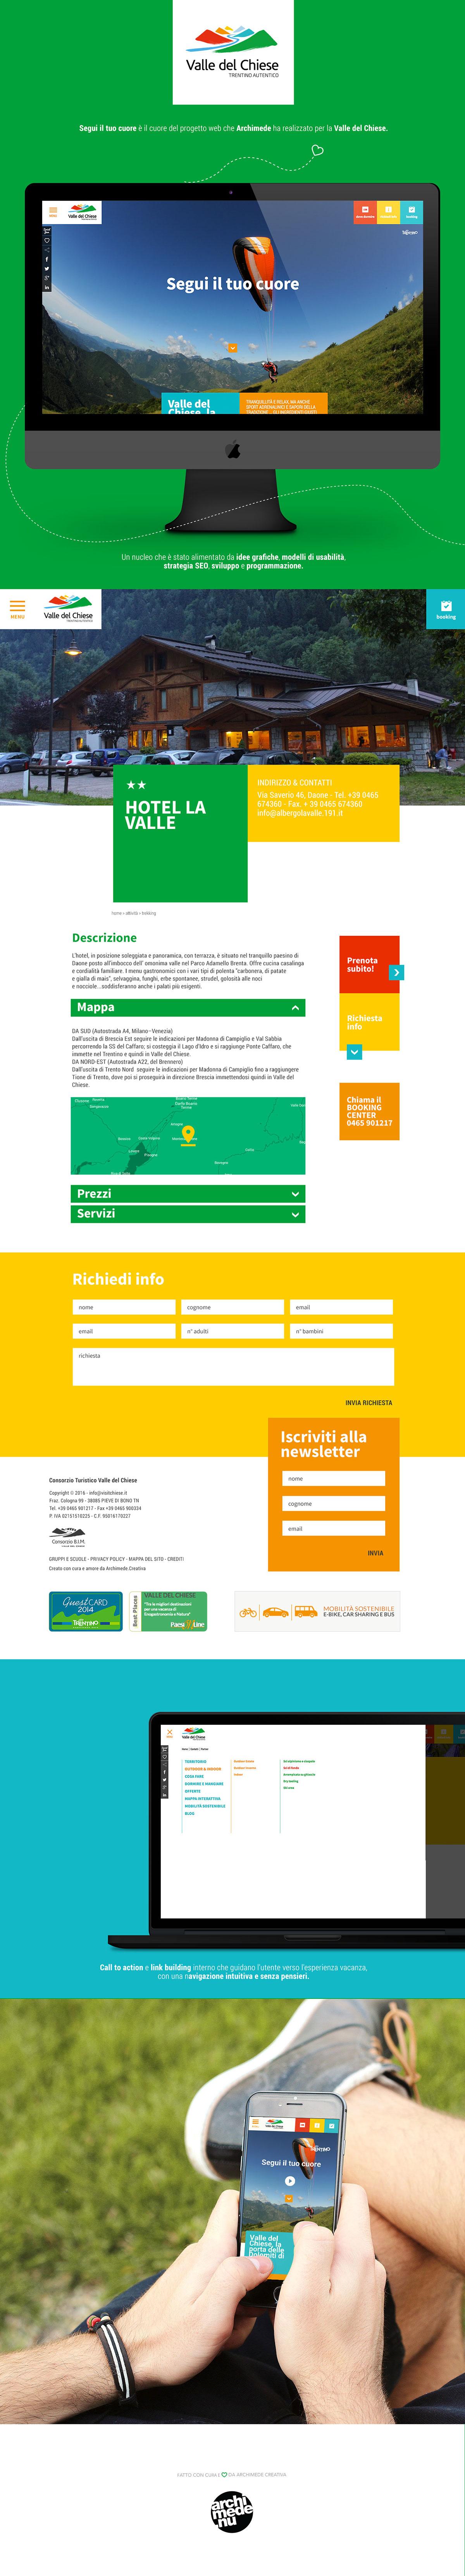 Visit Chiese Archimede Web Agency tourism tourist website Materiale Design Responsive Design mobile design Website website mock up UI ux sito web